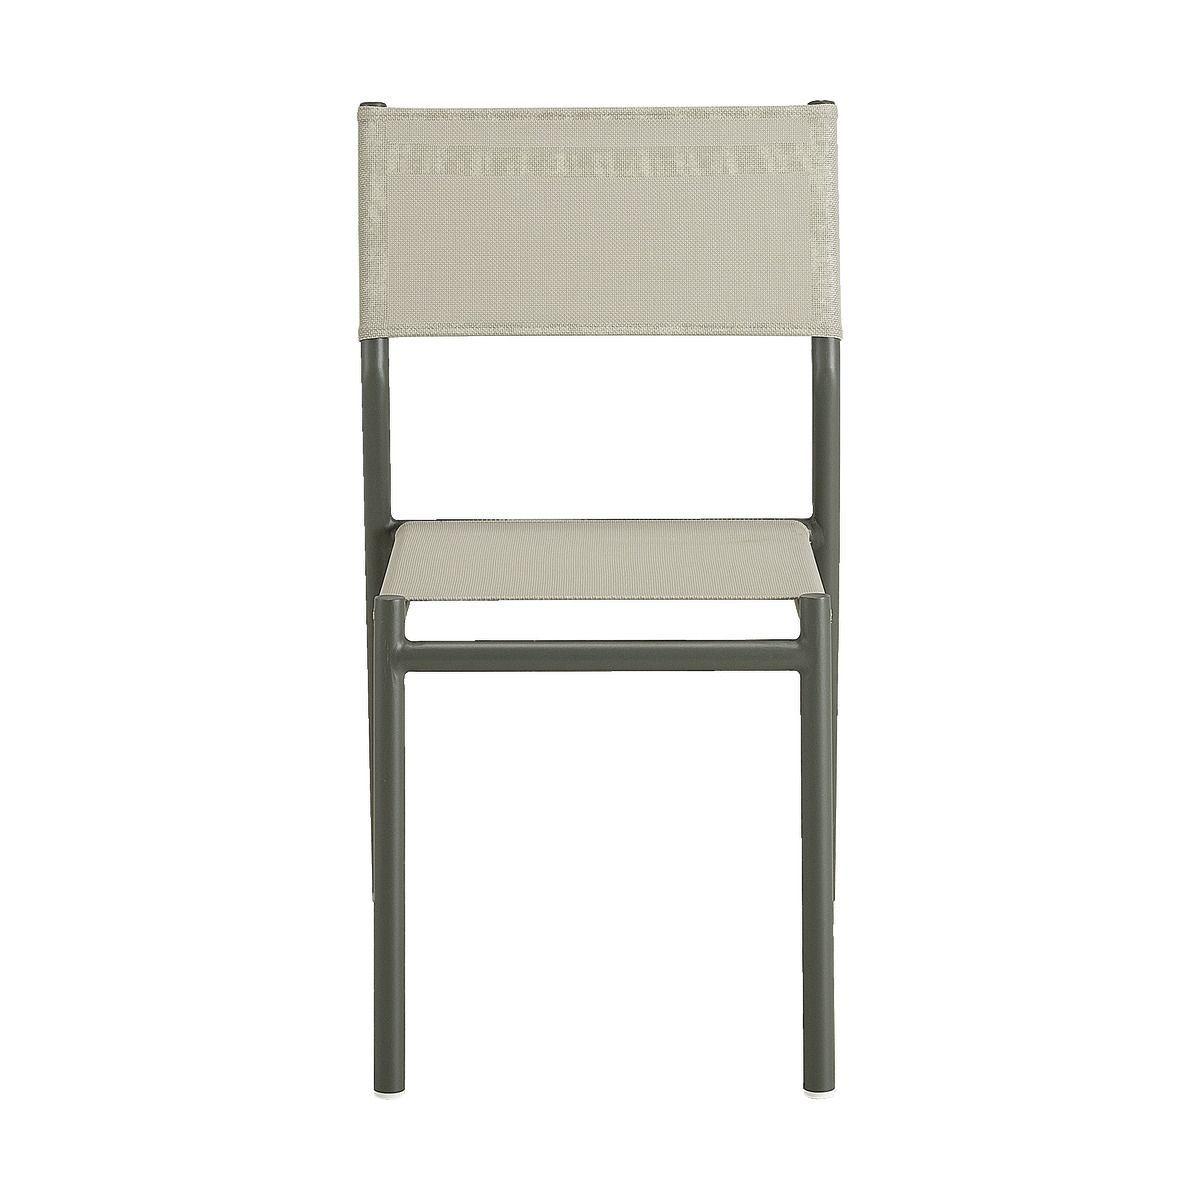 Chaise De Jardin En Aluminium Et Textilene Vert Olivier Sausset Chaises De Jardin Chais In 2020 Outdoor Chairs Folding Chair Furniture